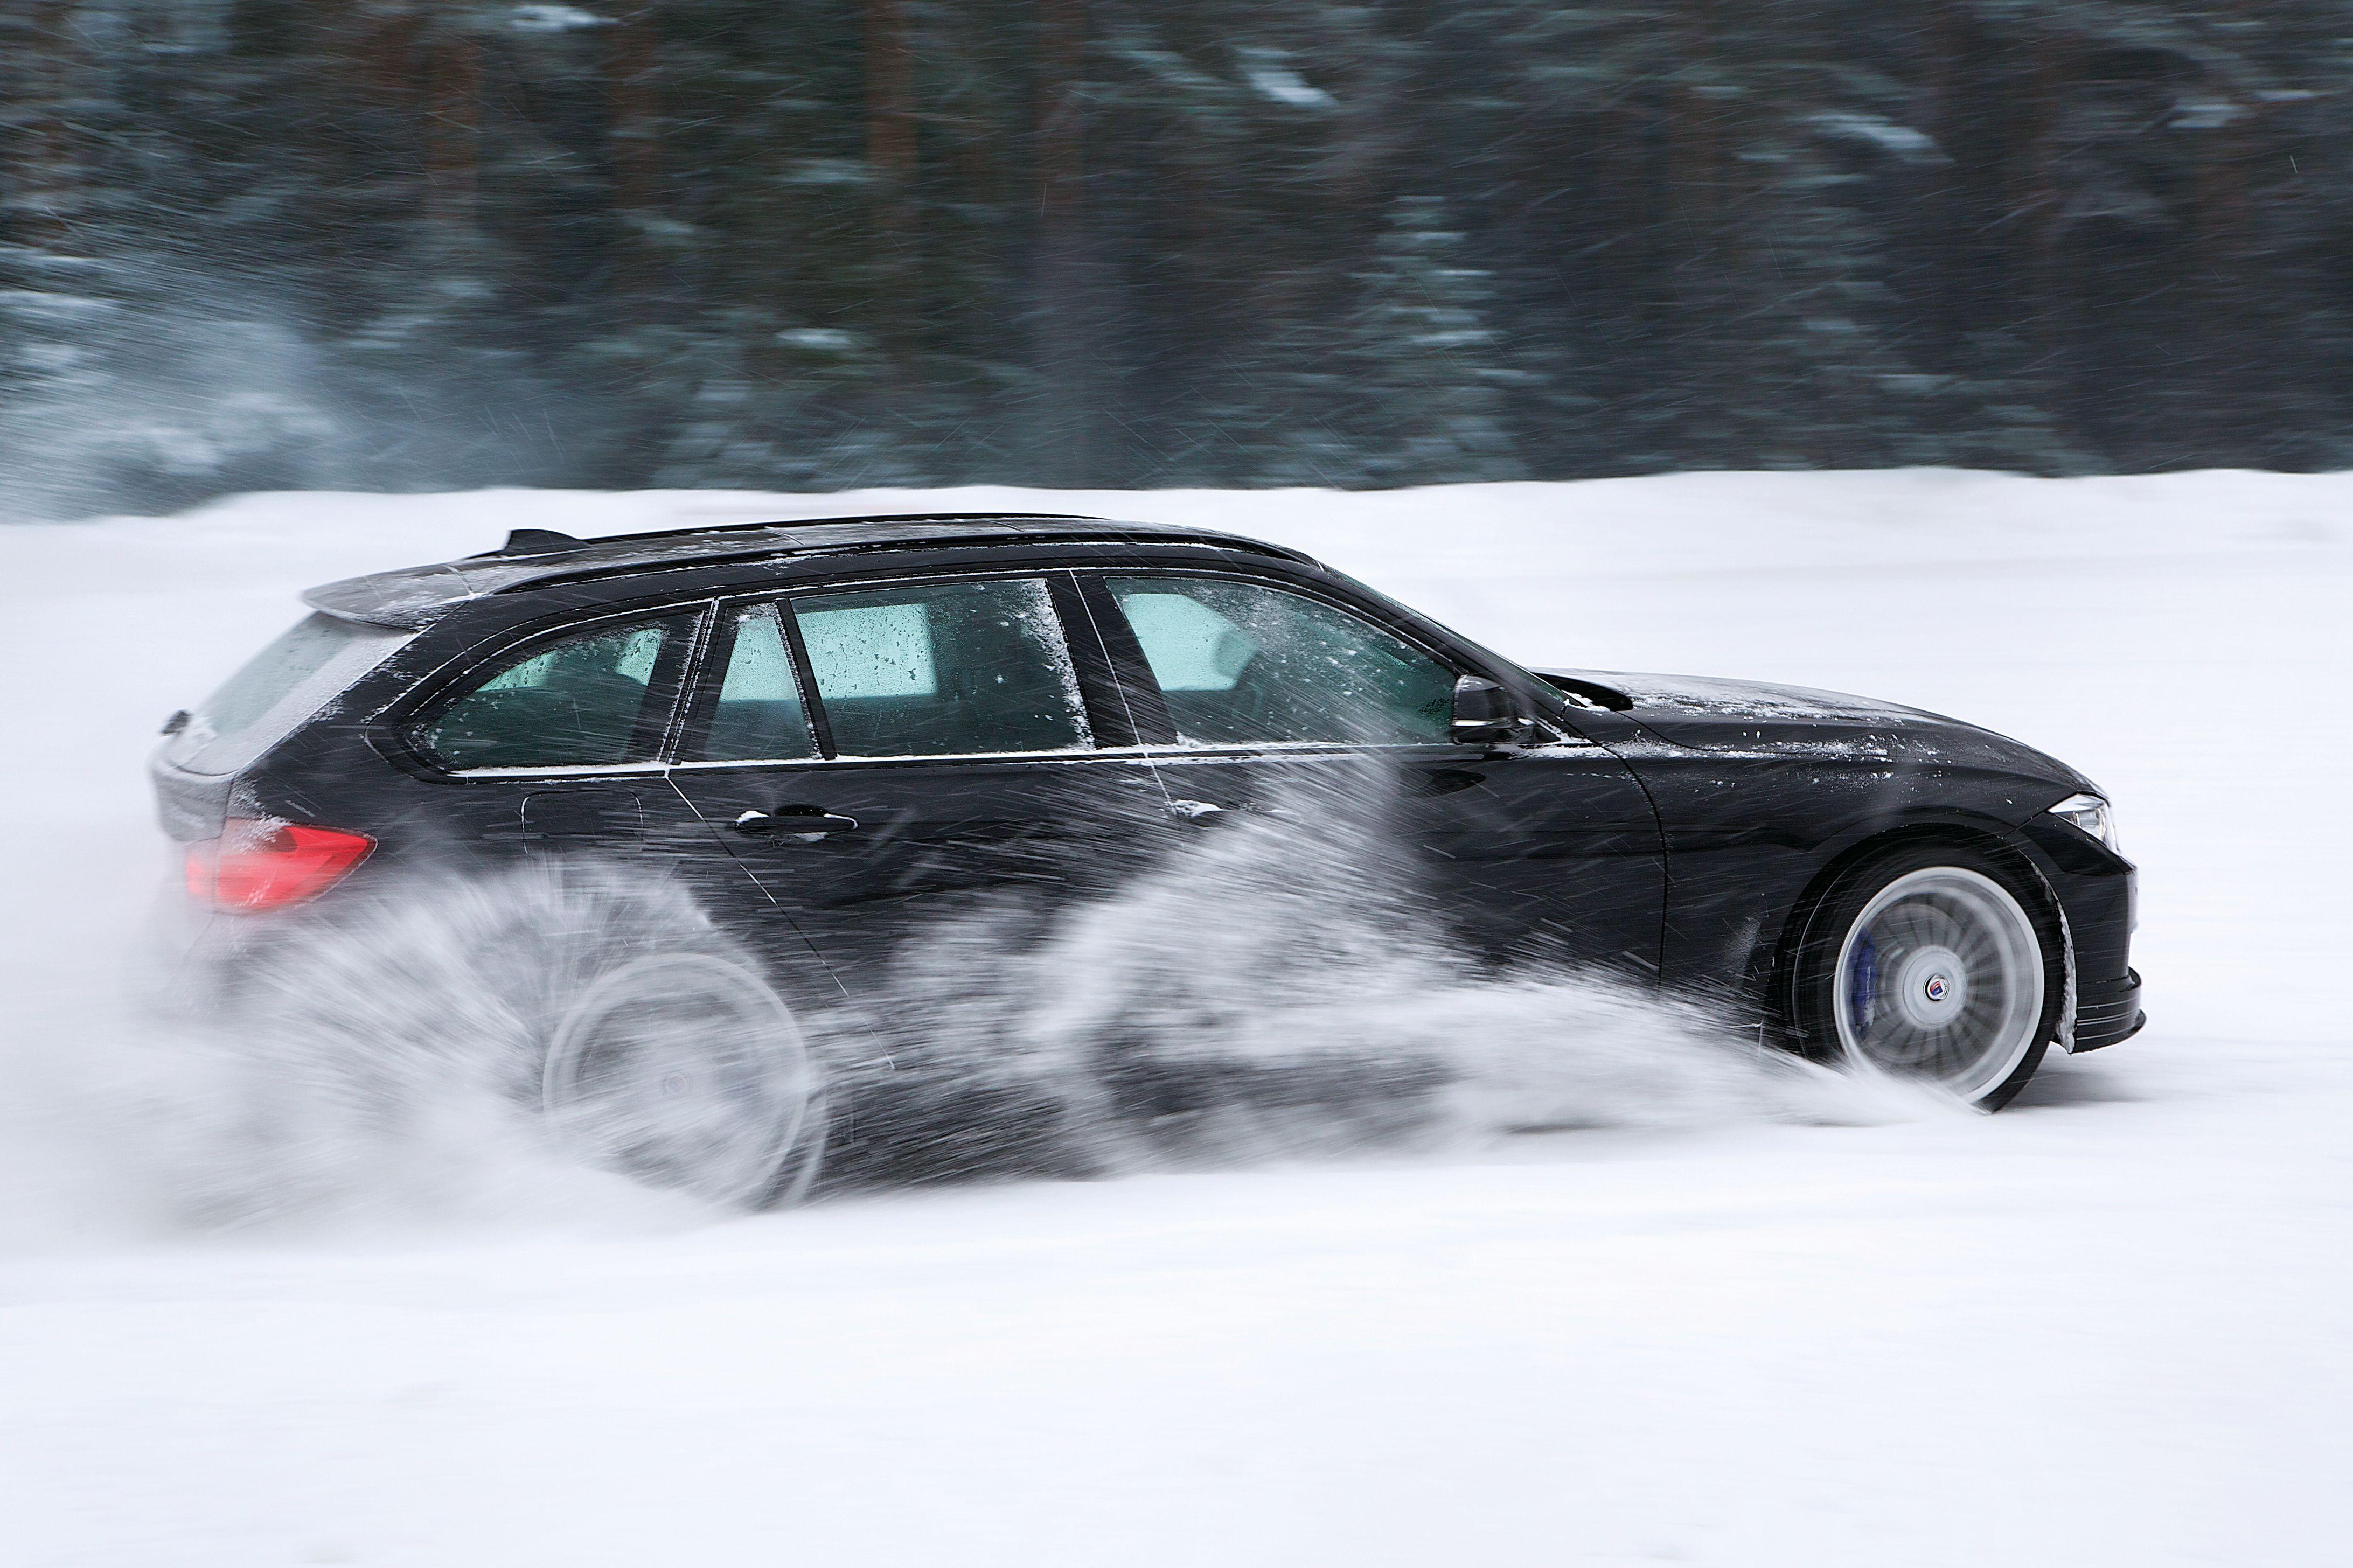 BMW_ALPINA_B3_BITURBO_17 Bmw touring, Alpina, Bmw